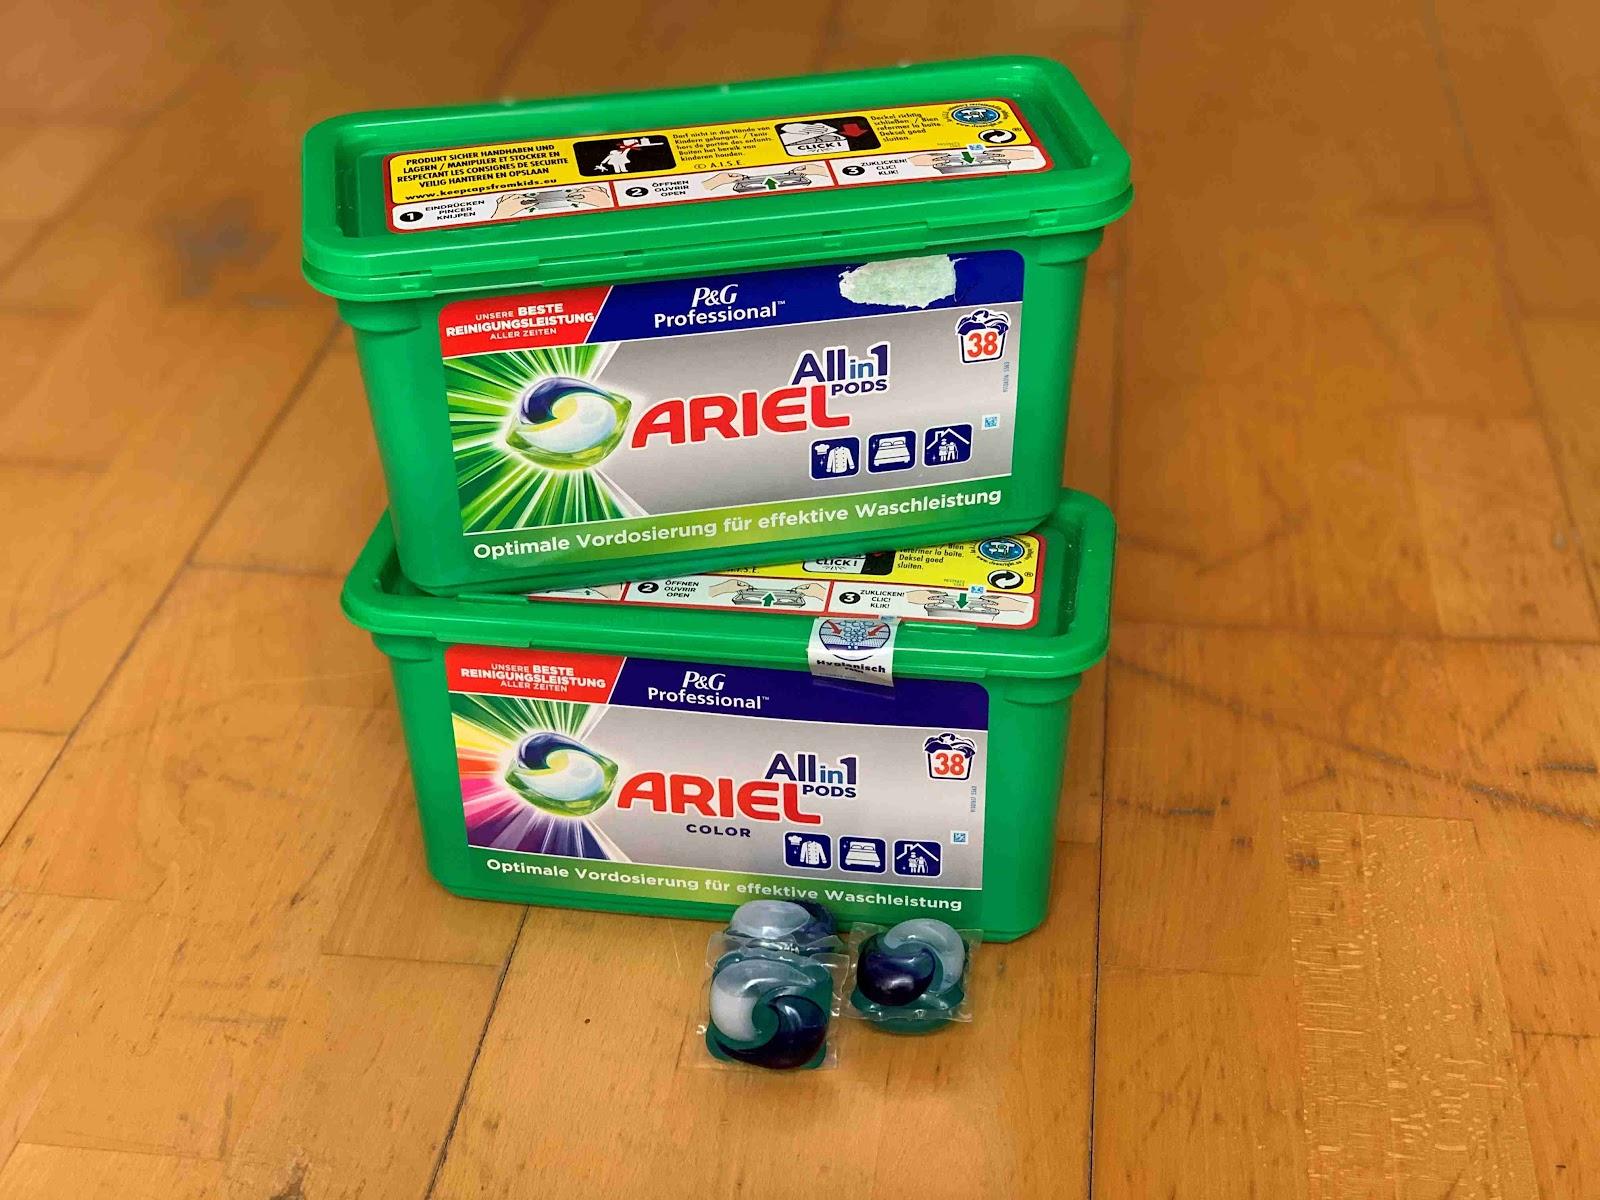 Recenze Drogerie-Domu: Prací kapsle Ariel Professional All in 1